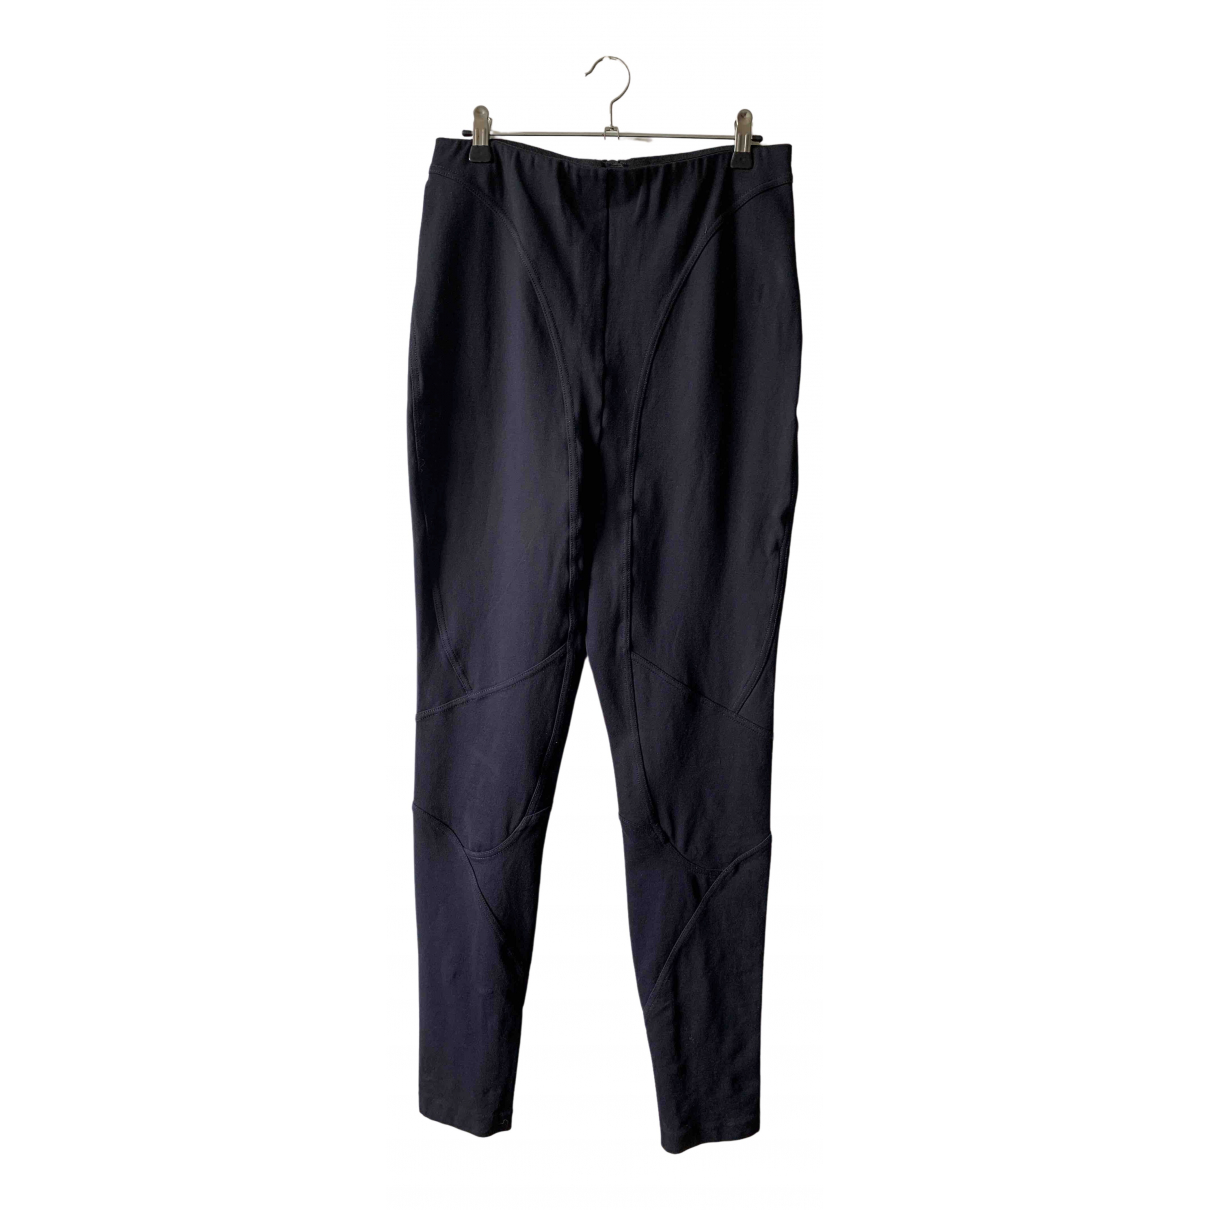 Acne Studios \N Black Trousers for Women 42 FR